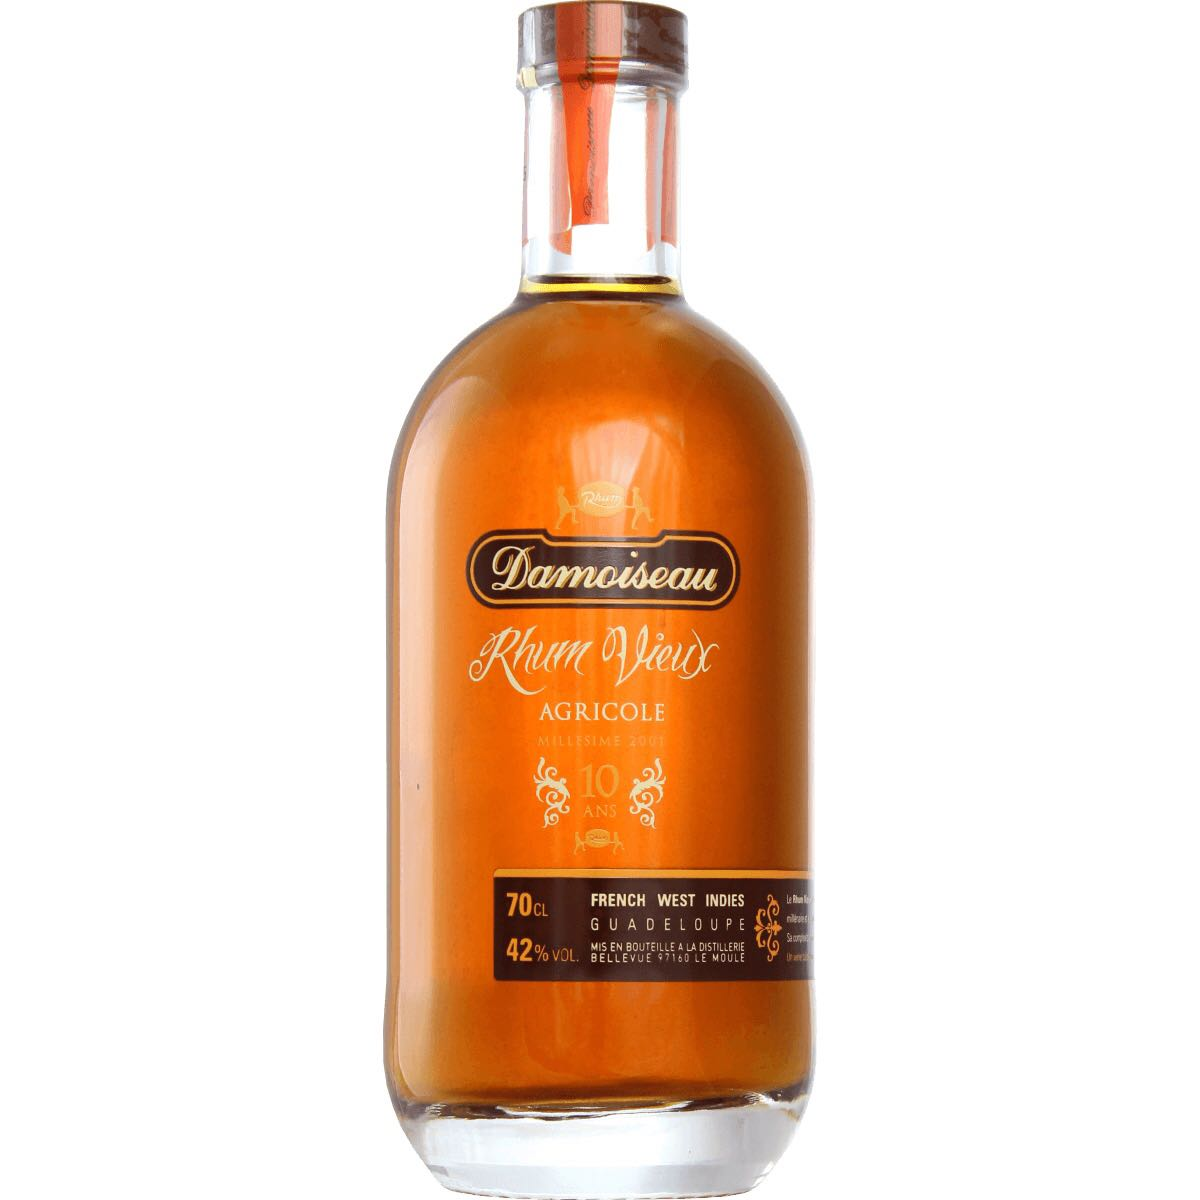 Bottle image of Rhum Vieux Agricole 10 Ans